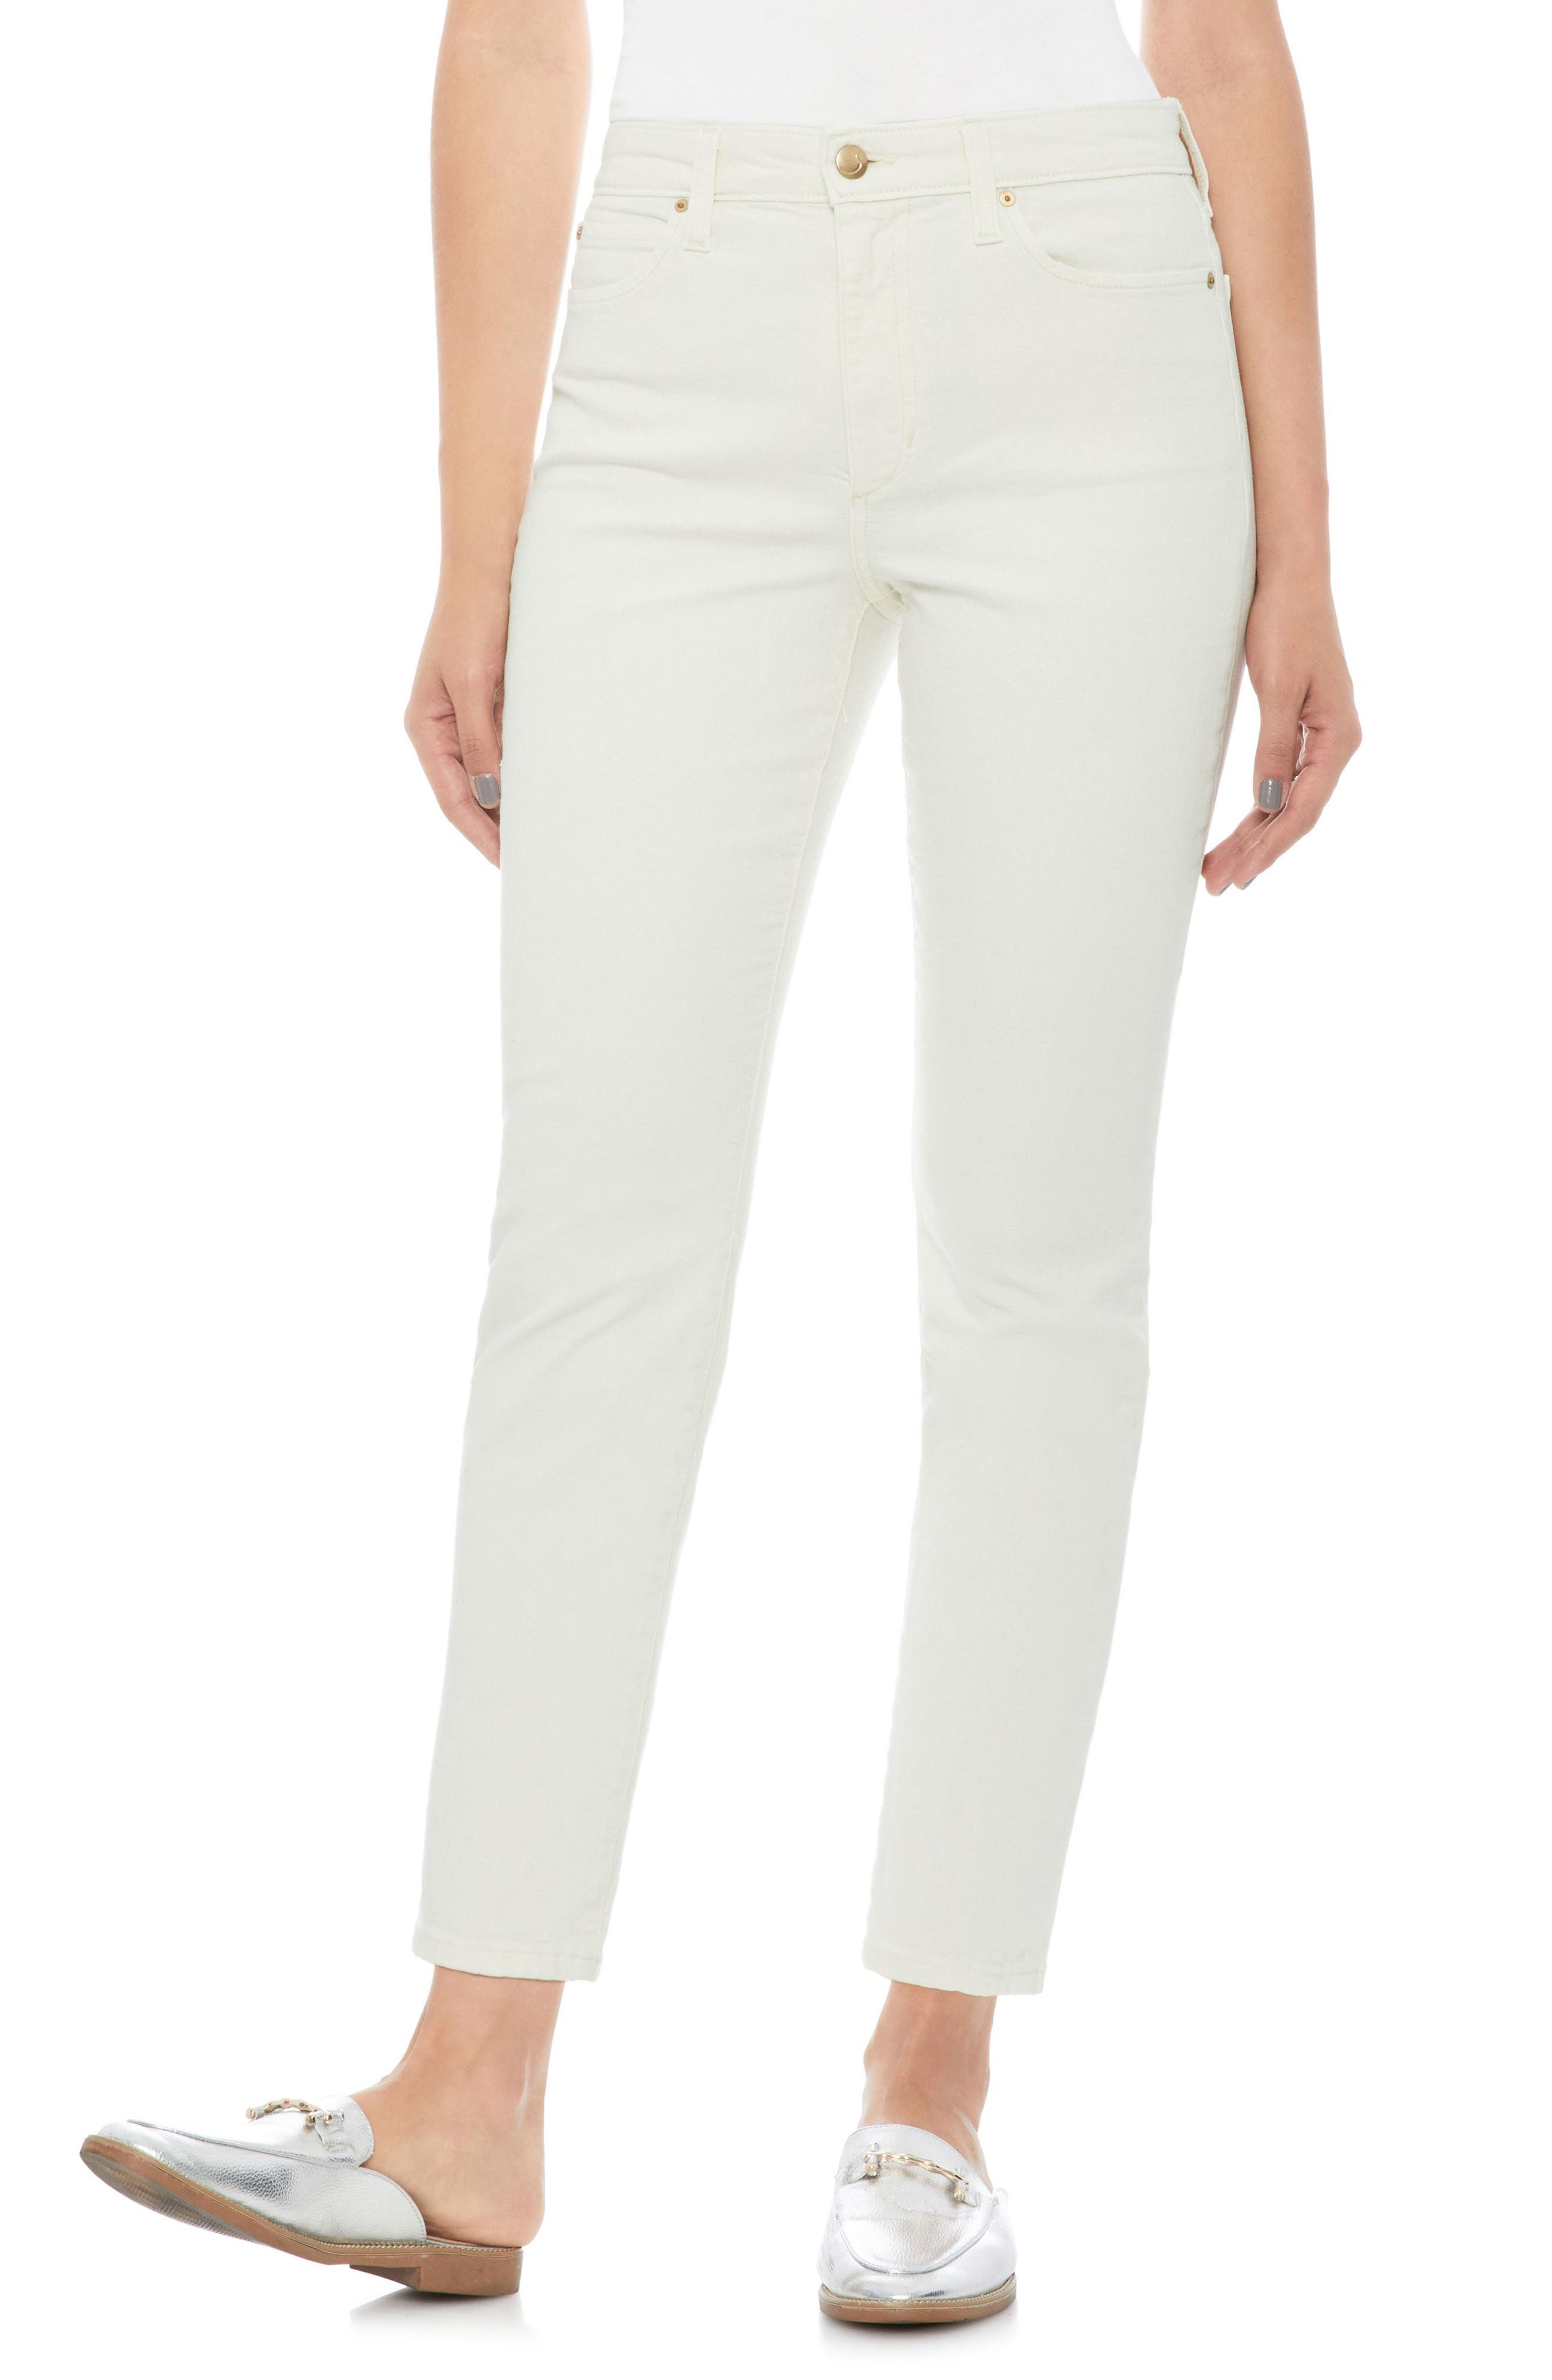 Smith High Waist Ankle Slim Jeans,                             Main thumbnail 1, color,                             Layton